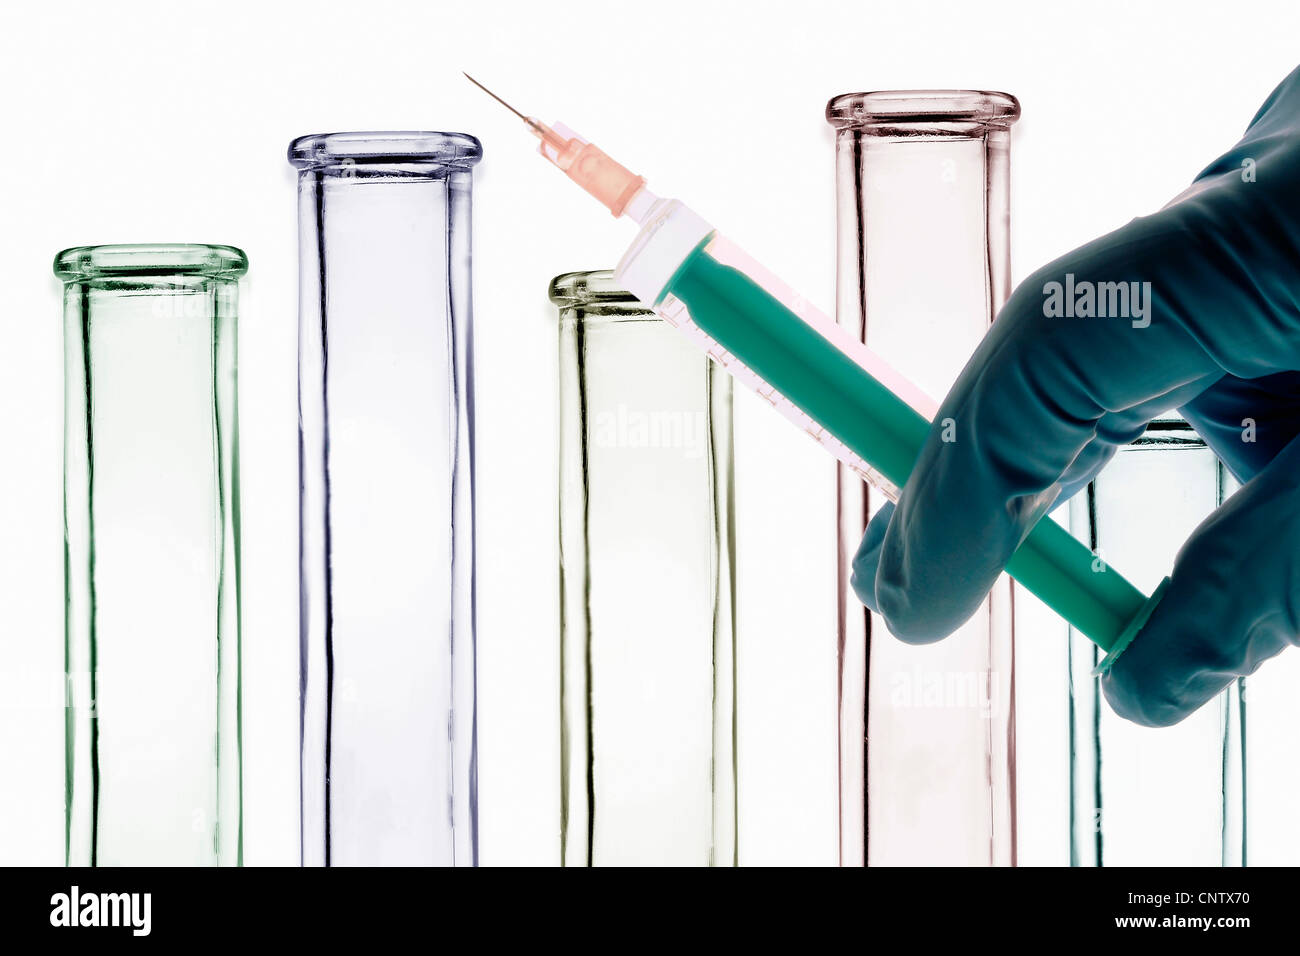 Scientist holding syringe in lab - Stock Image